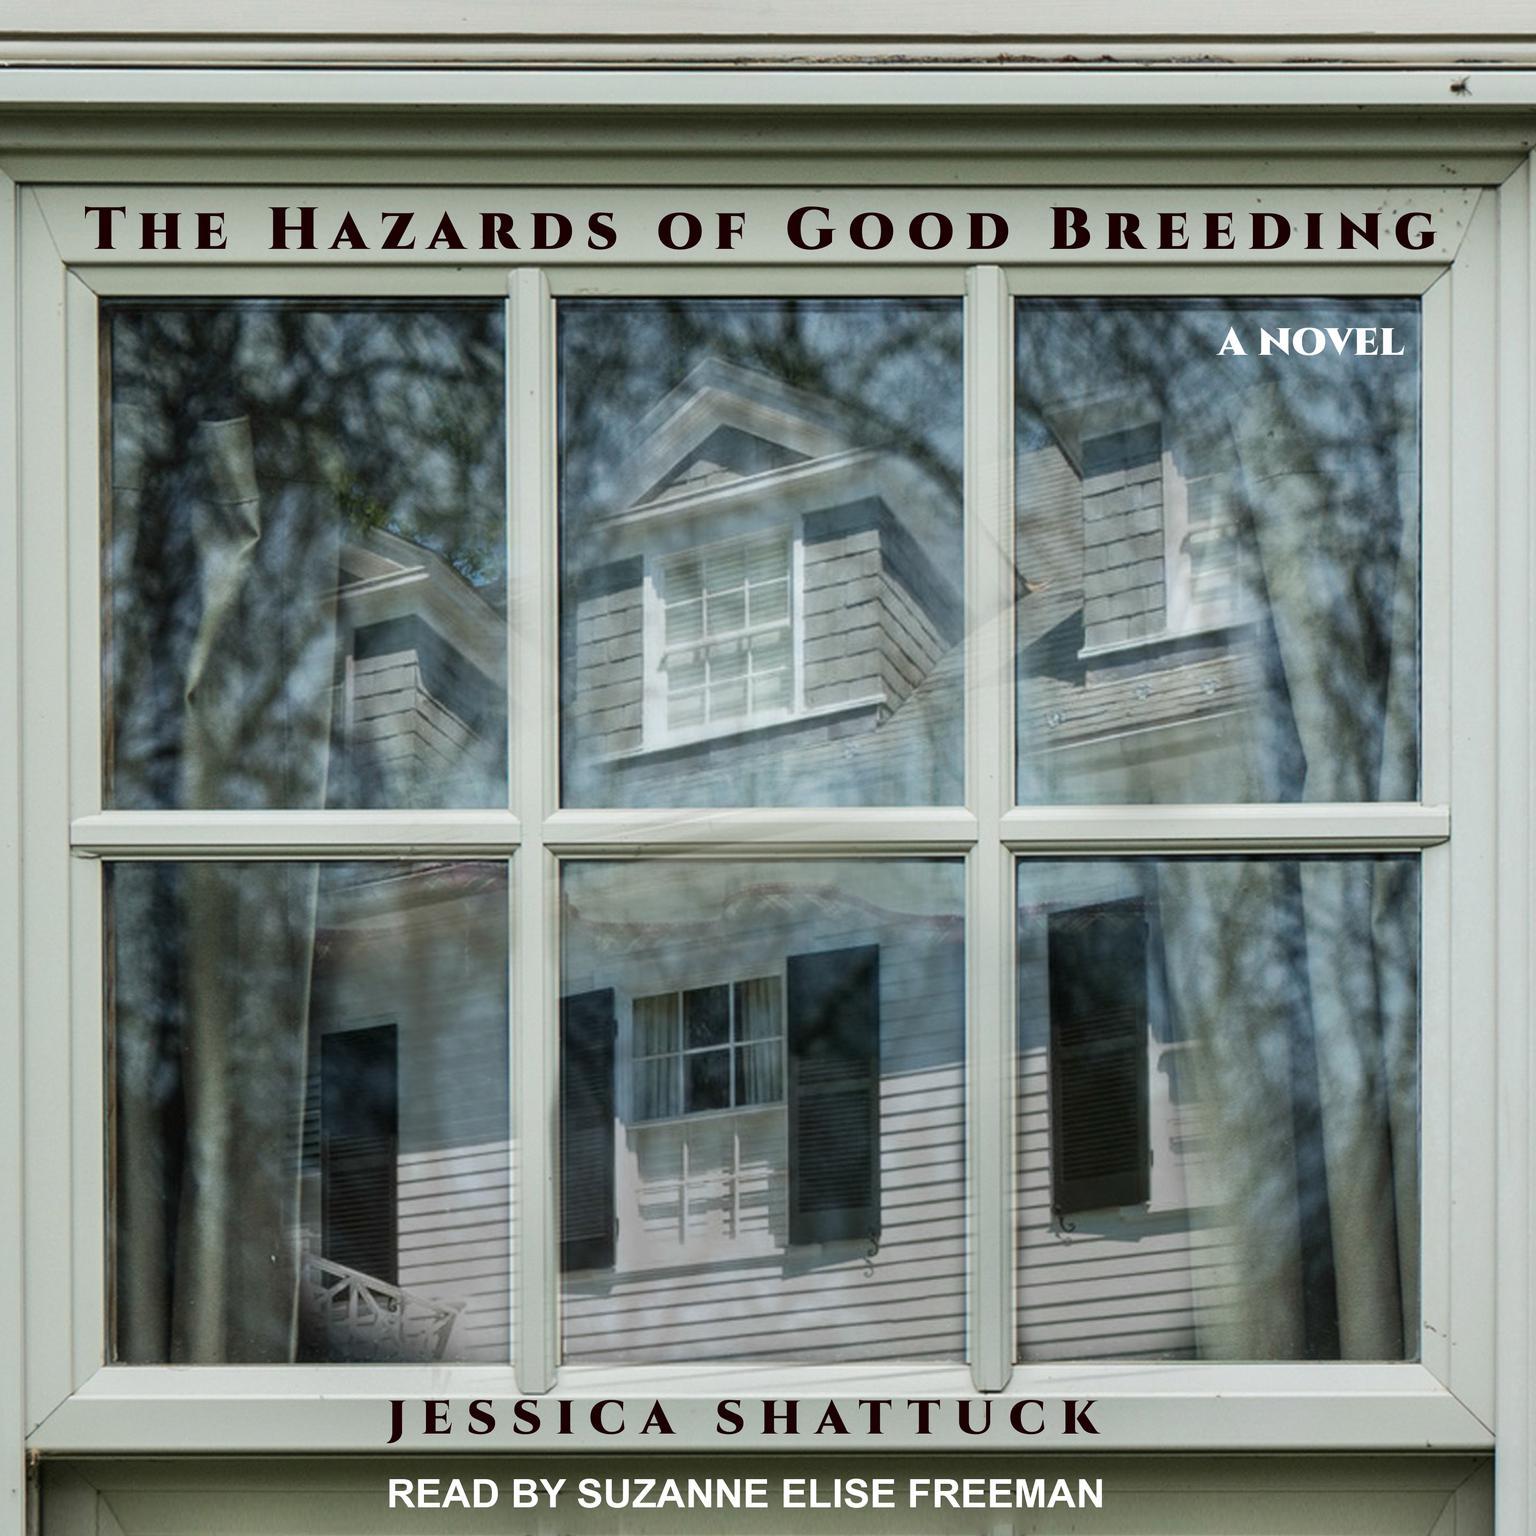 The Hazards of Good Breeding: A Novel Audiobook, by Jessica Shattuck